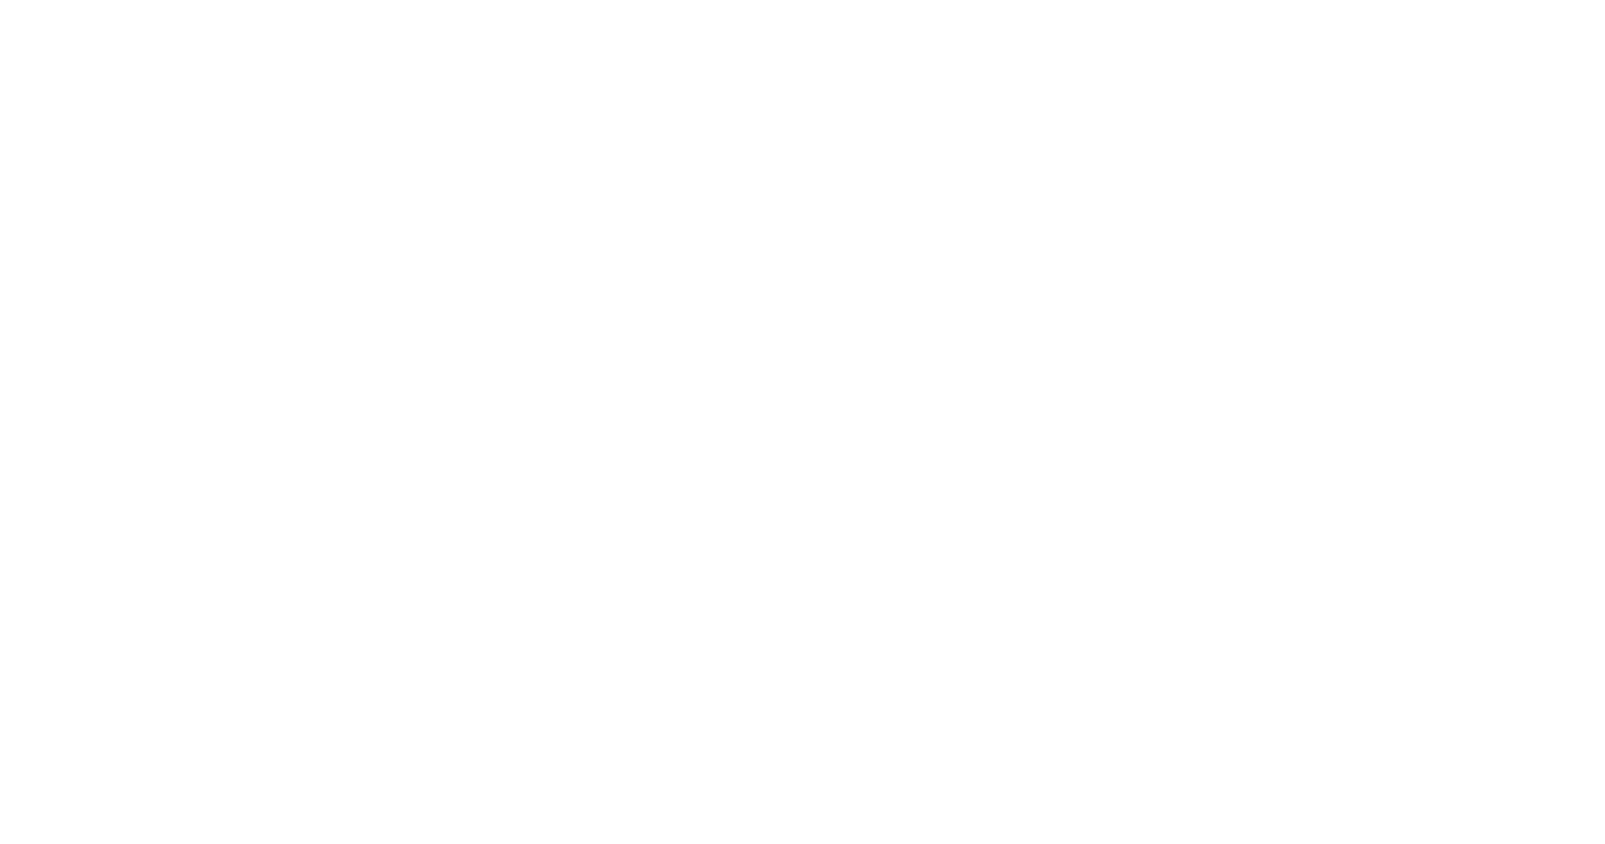 Brokerages Set NetApp Inc. (NTAP) Target Price at $38.14